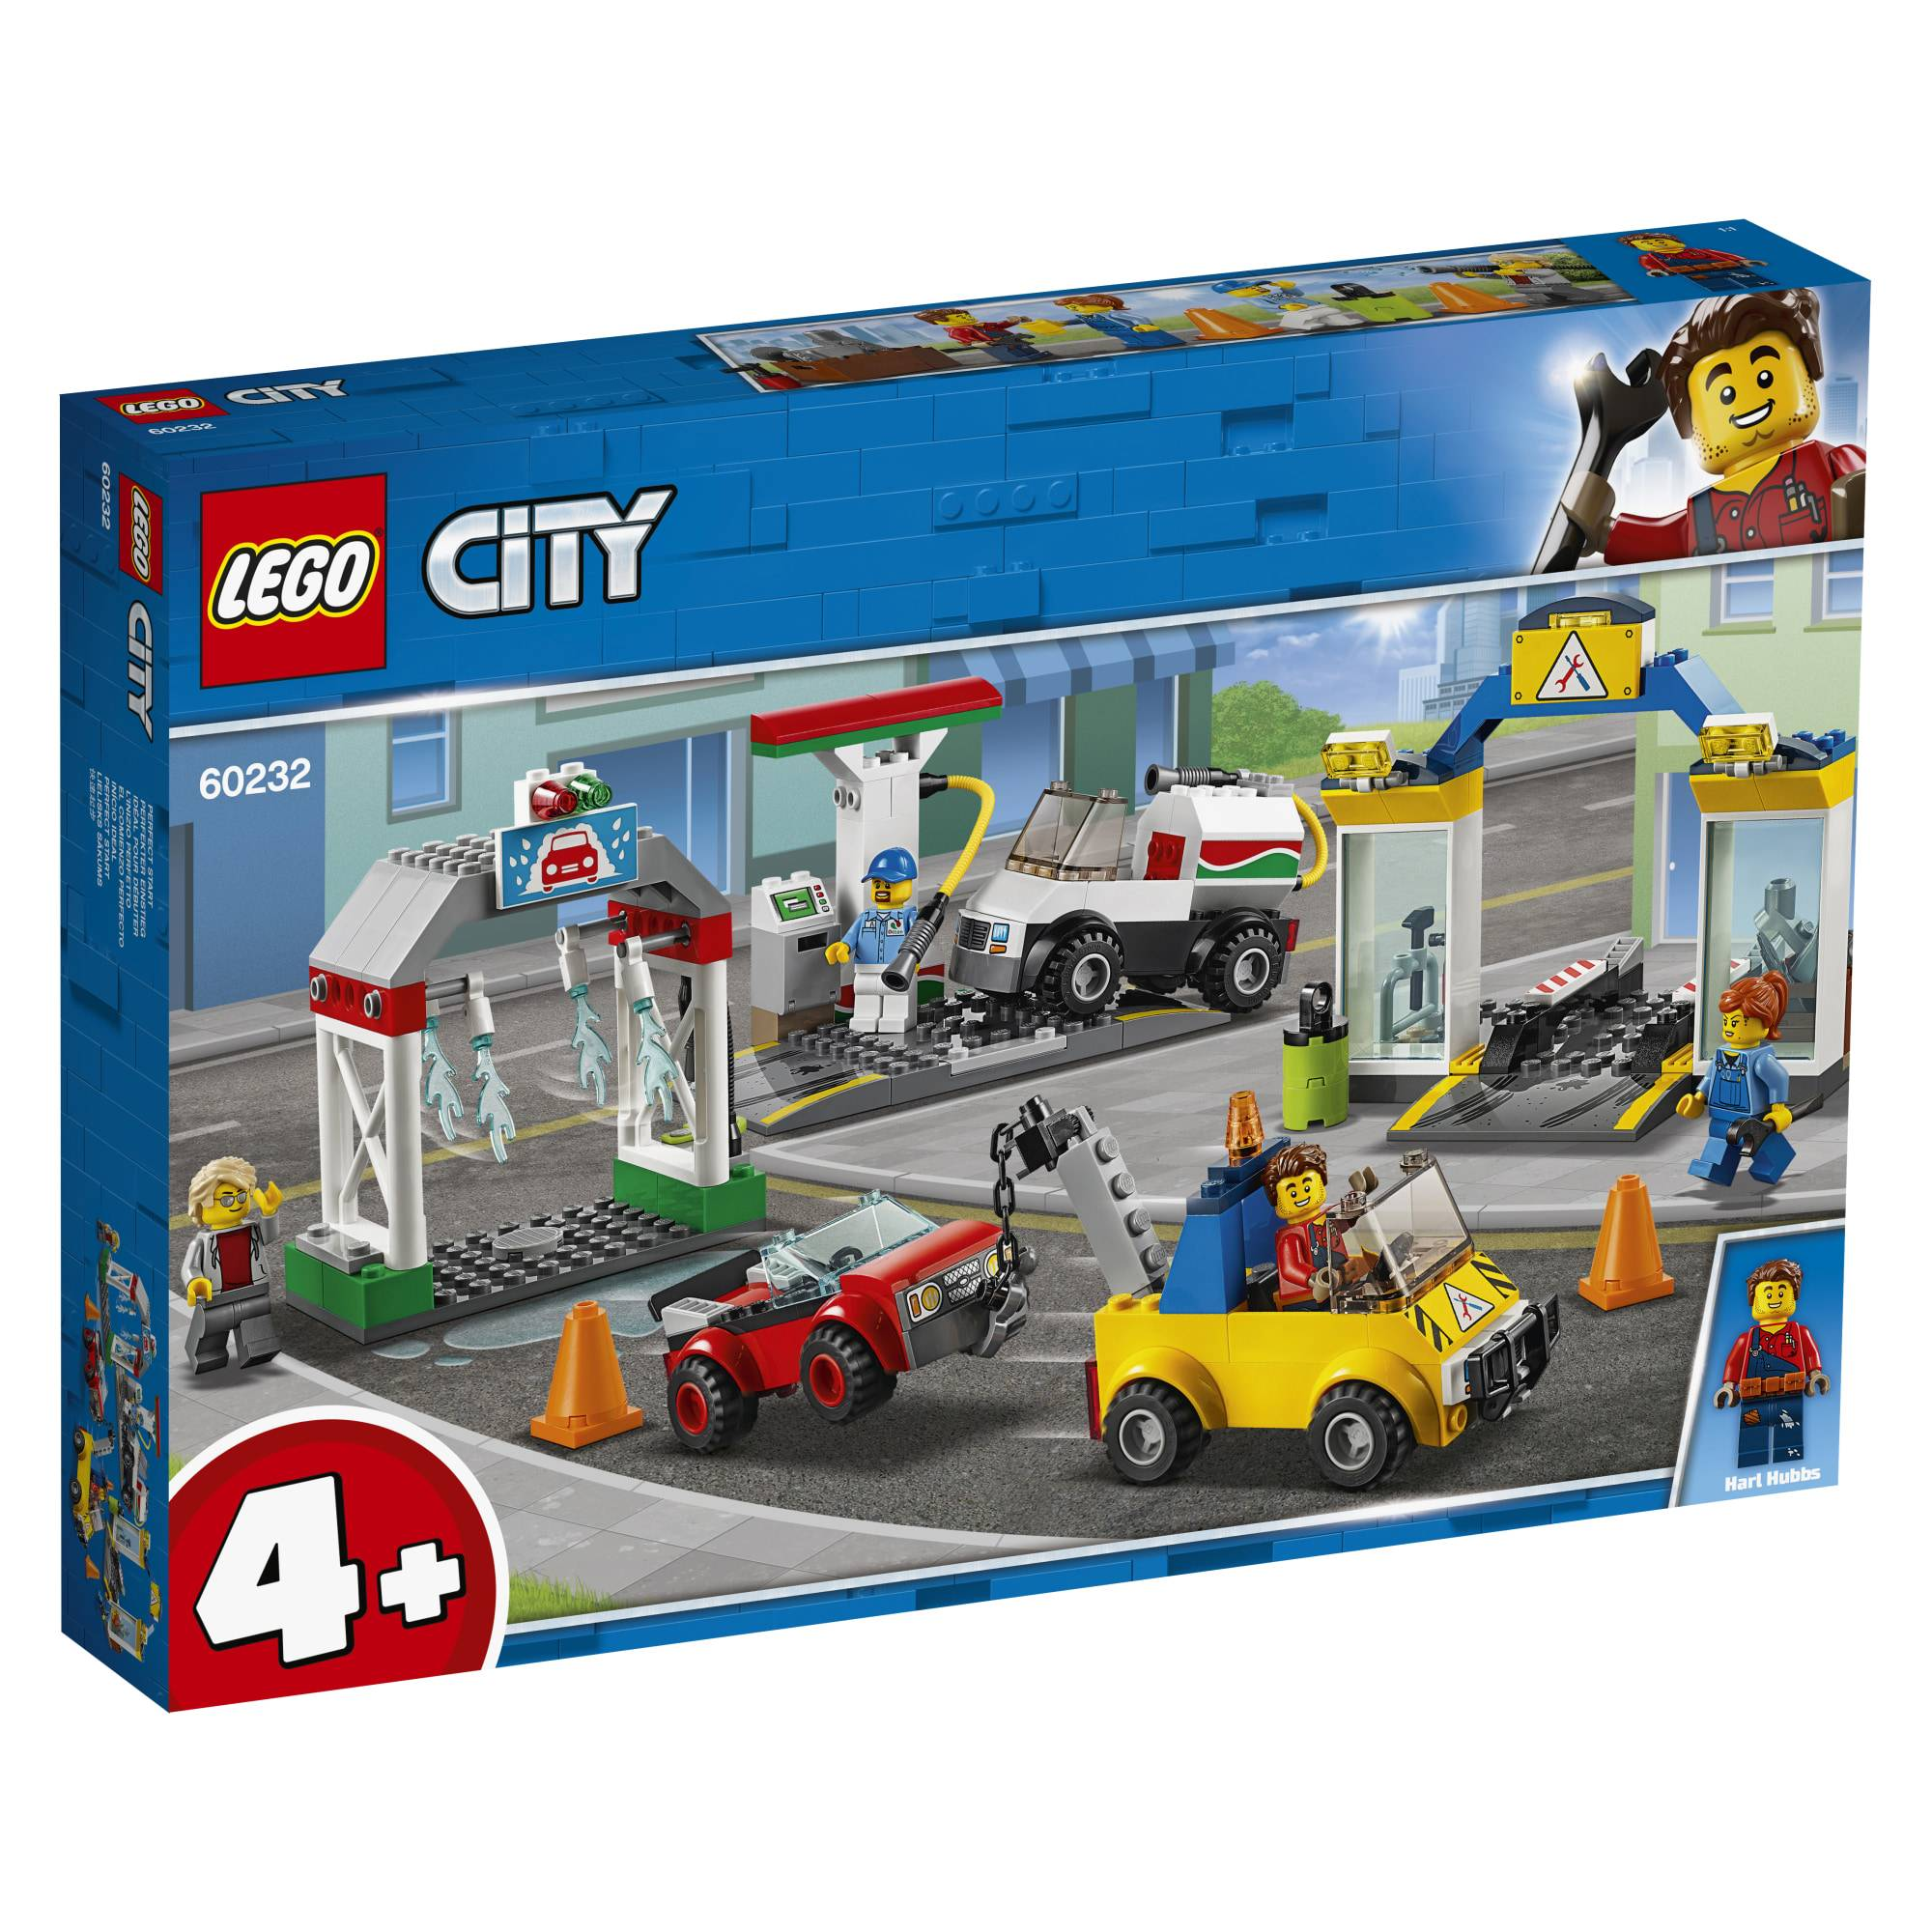 Lego 60232 City Town Huoltoasemakeskus